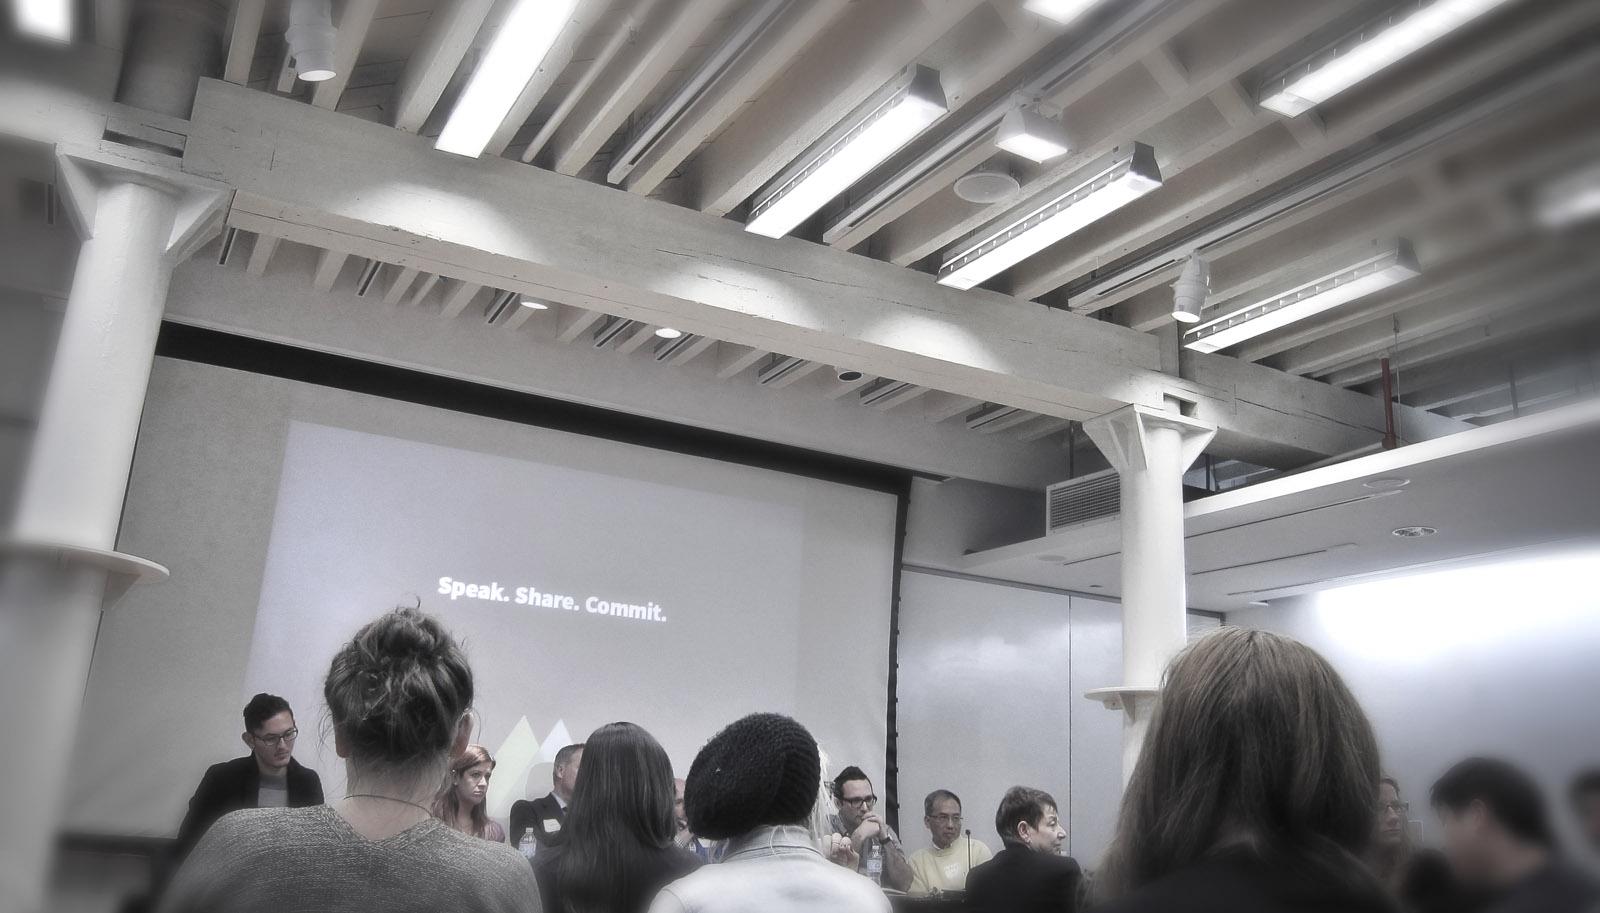 certifyD live event photo. Design certification dialogue. Pratt Institute, November 29th, 2012.